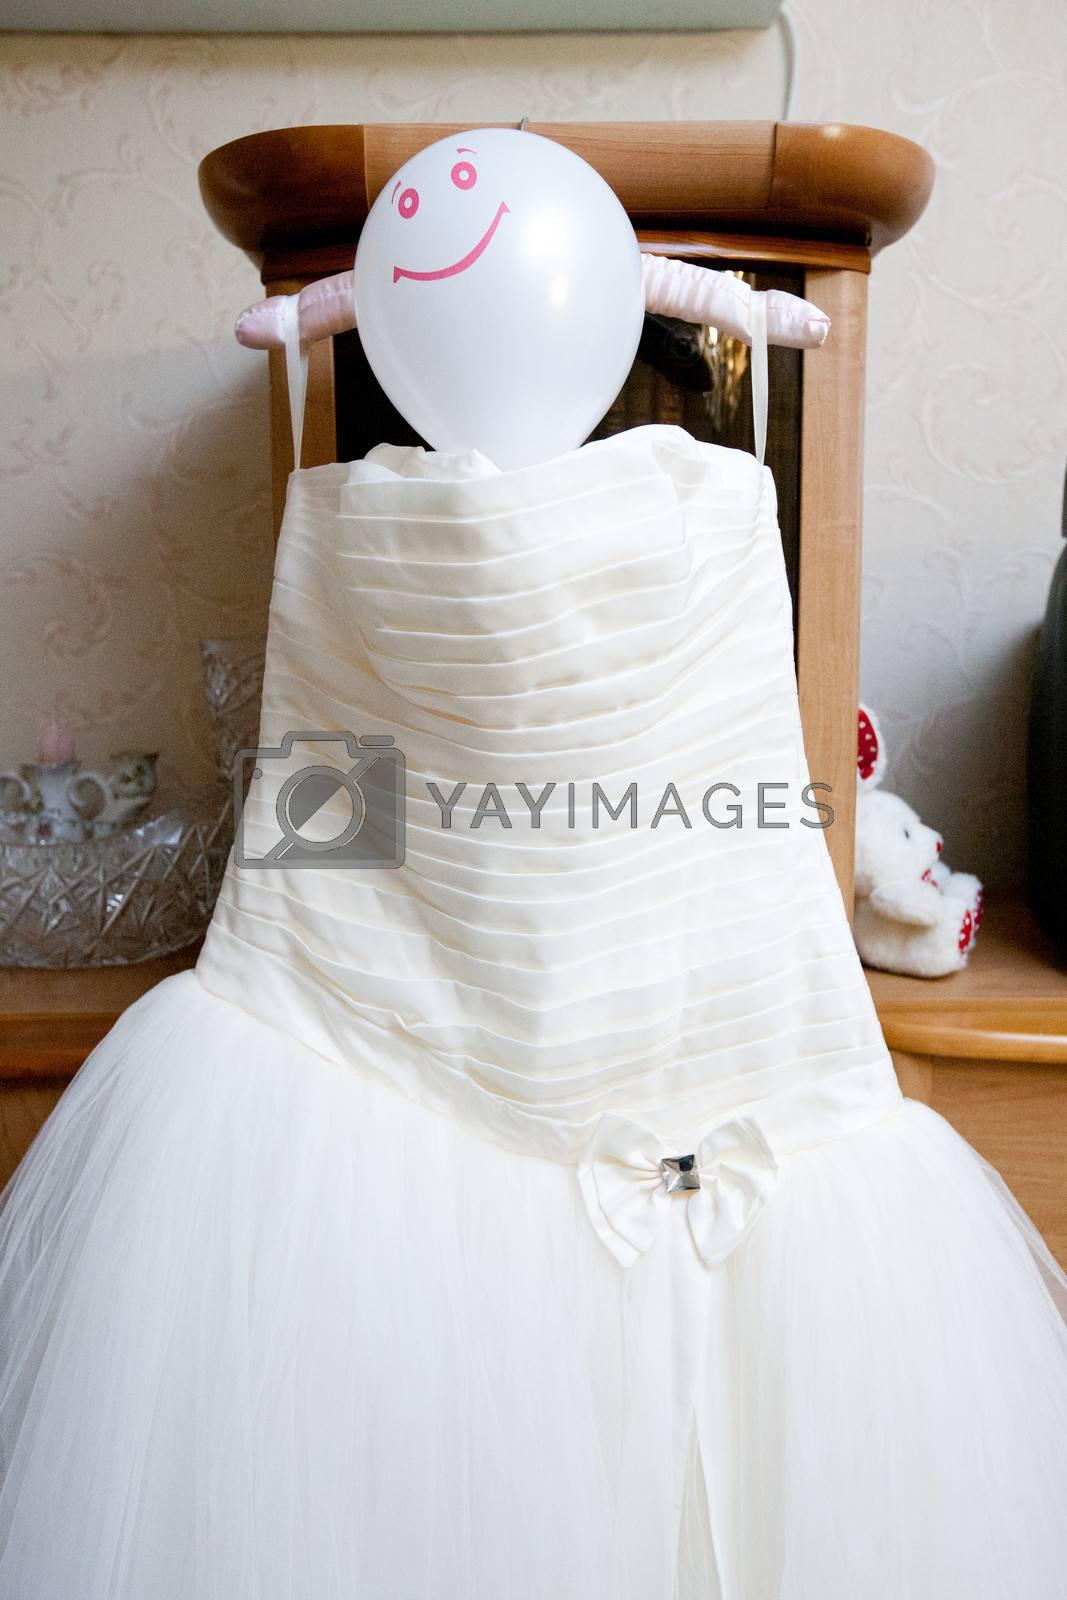 wedding dress with balloon as a head